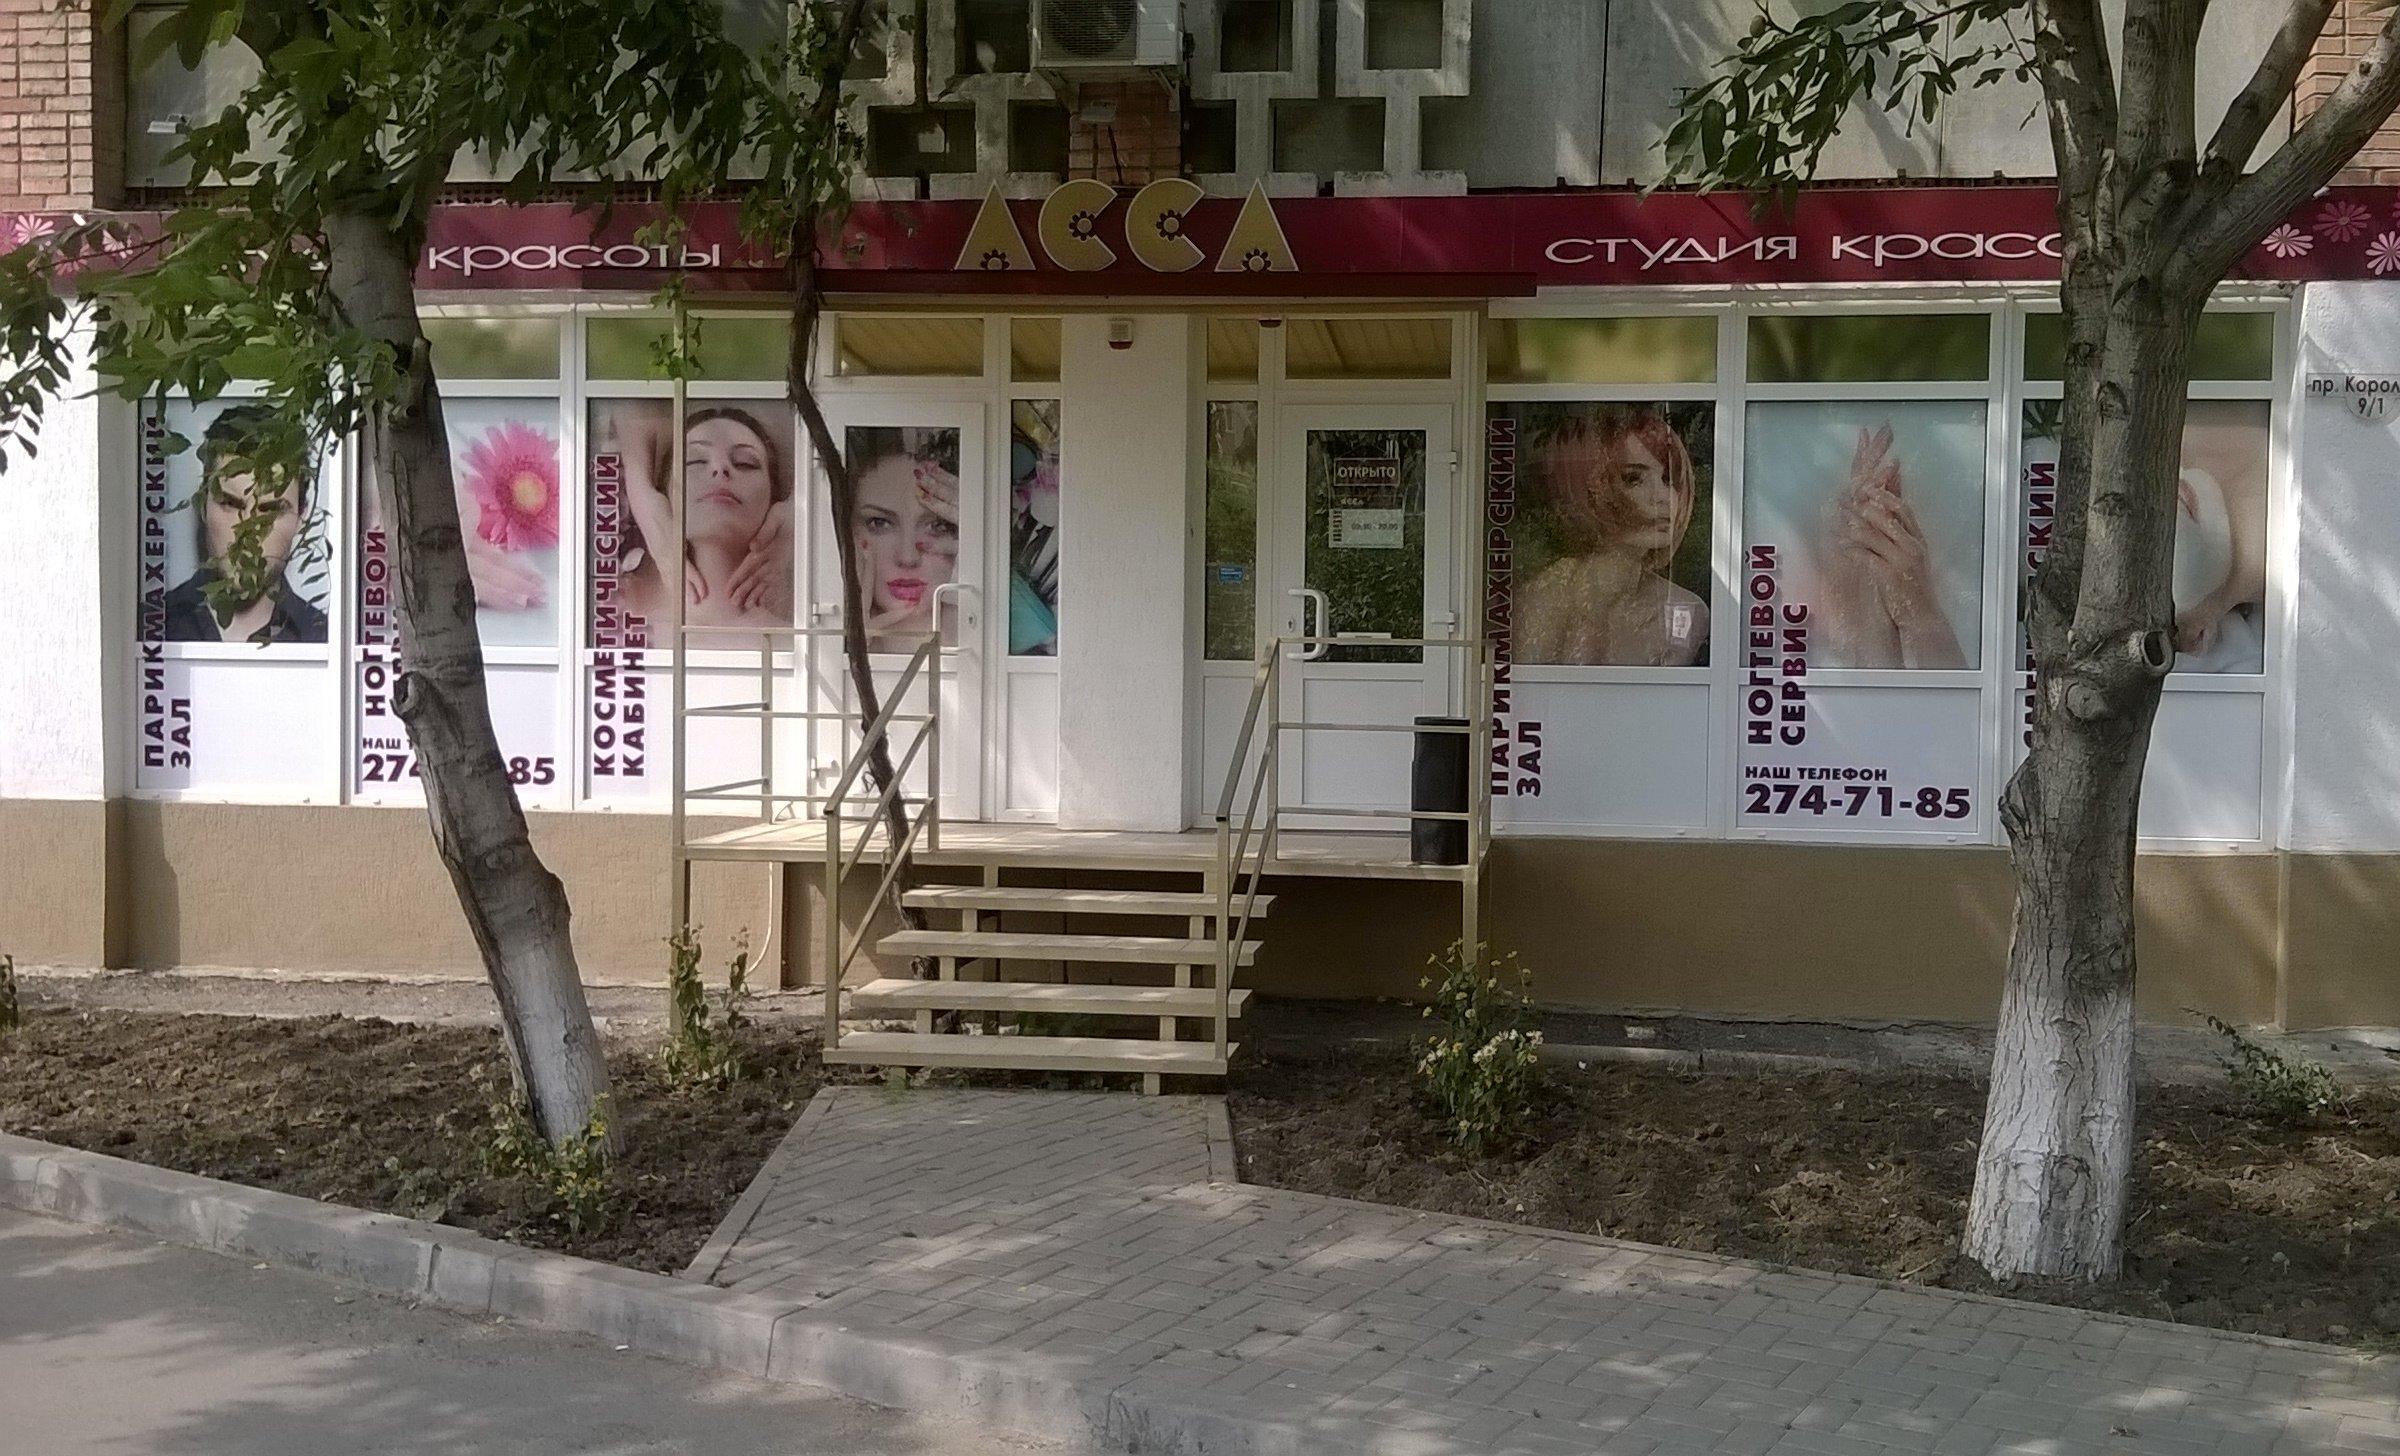 фотография Студии красоты Асса на проспекте Королёва